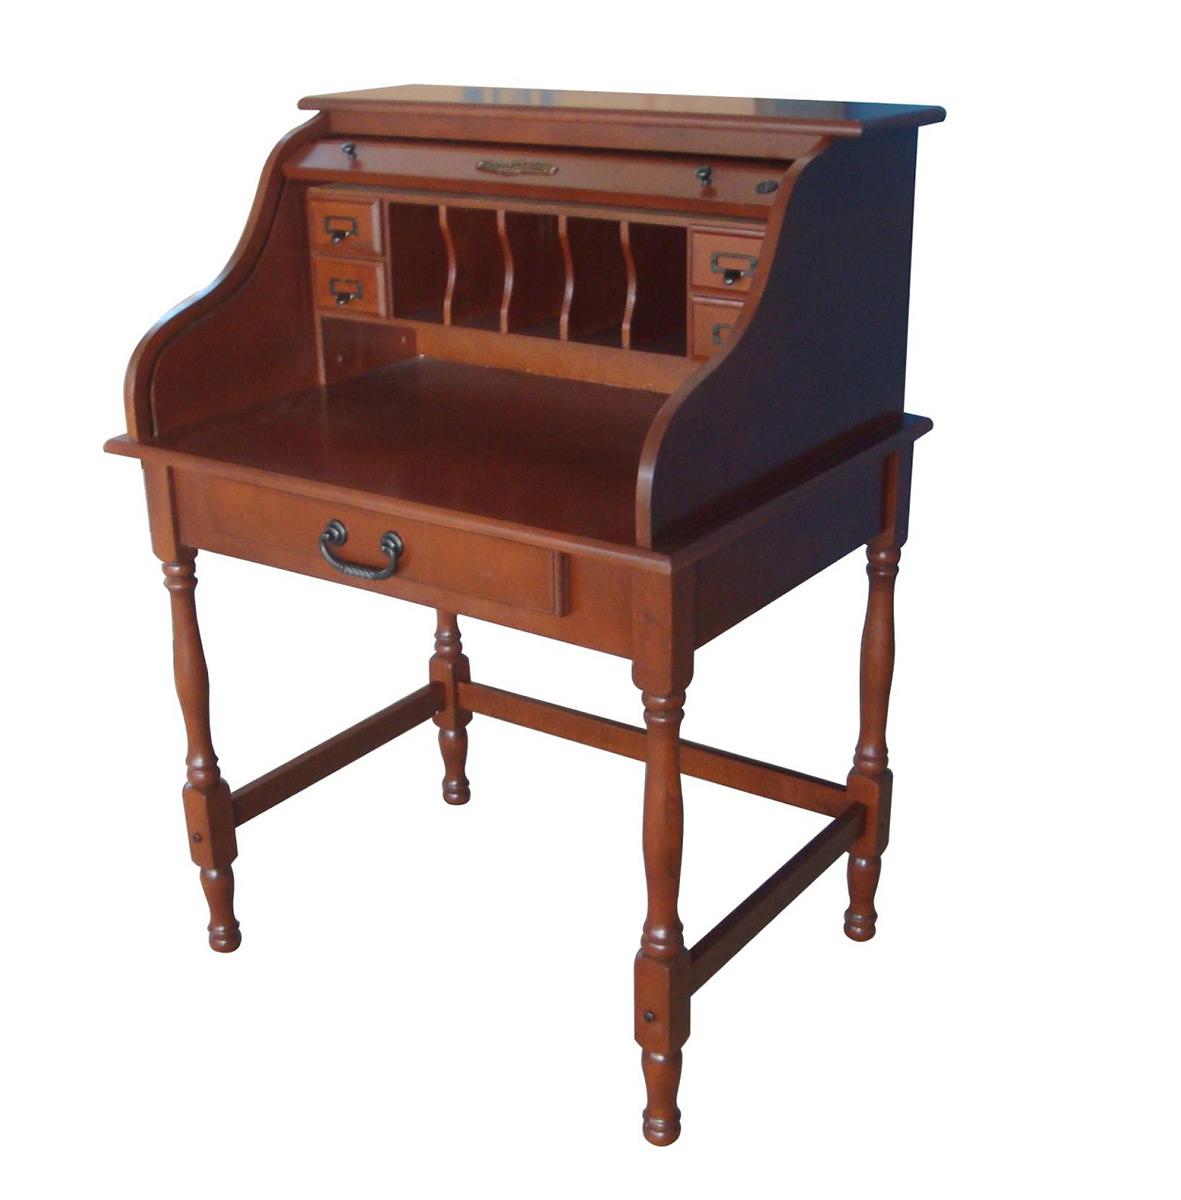 Chelsea Home Lonie 32-inch Mini Roll Top Desk - Cherry